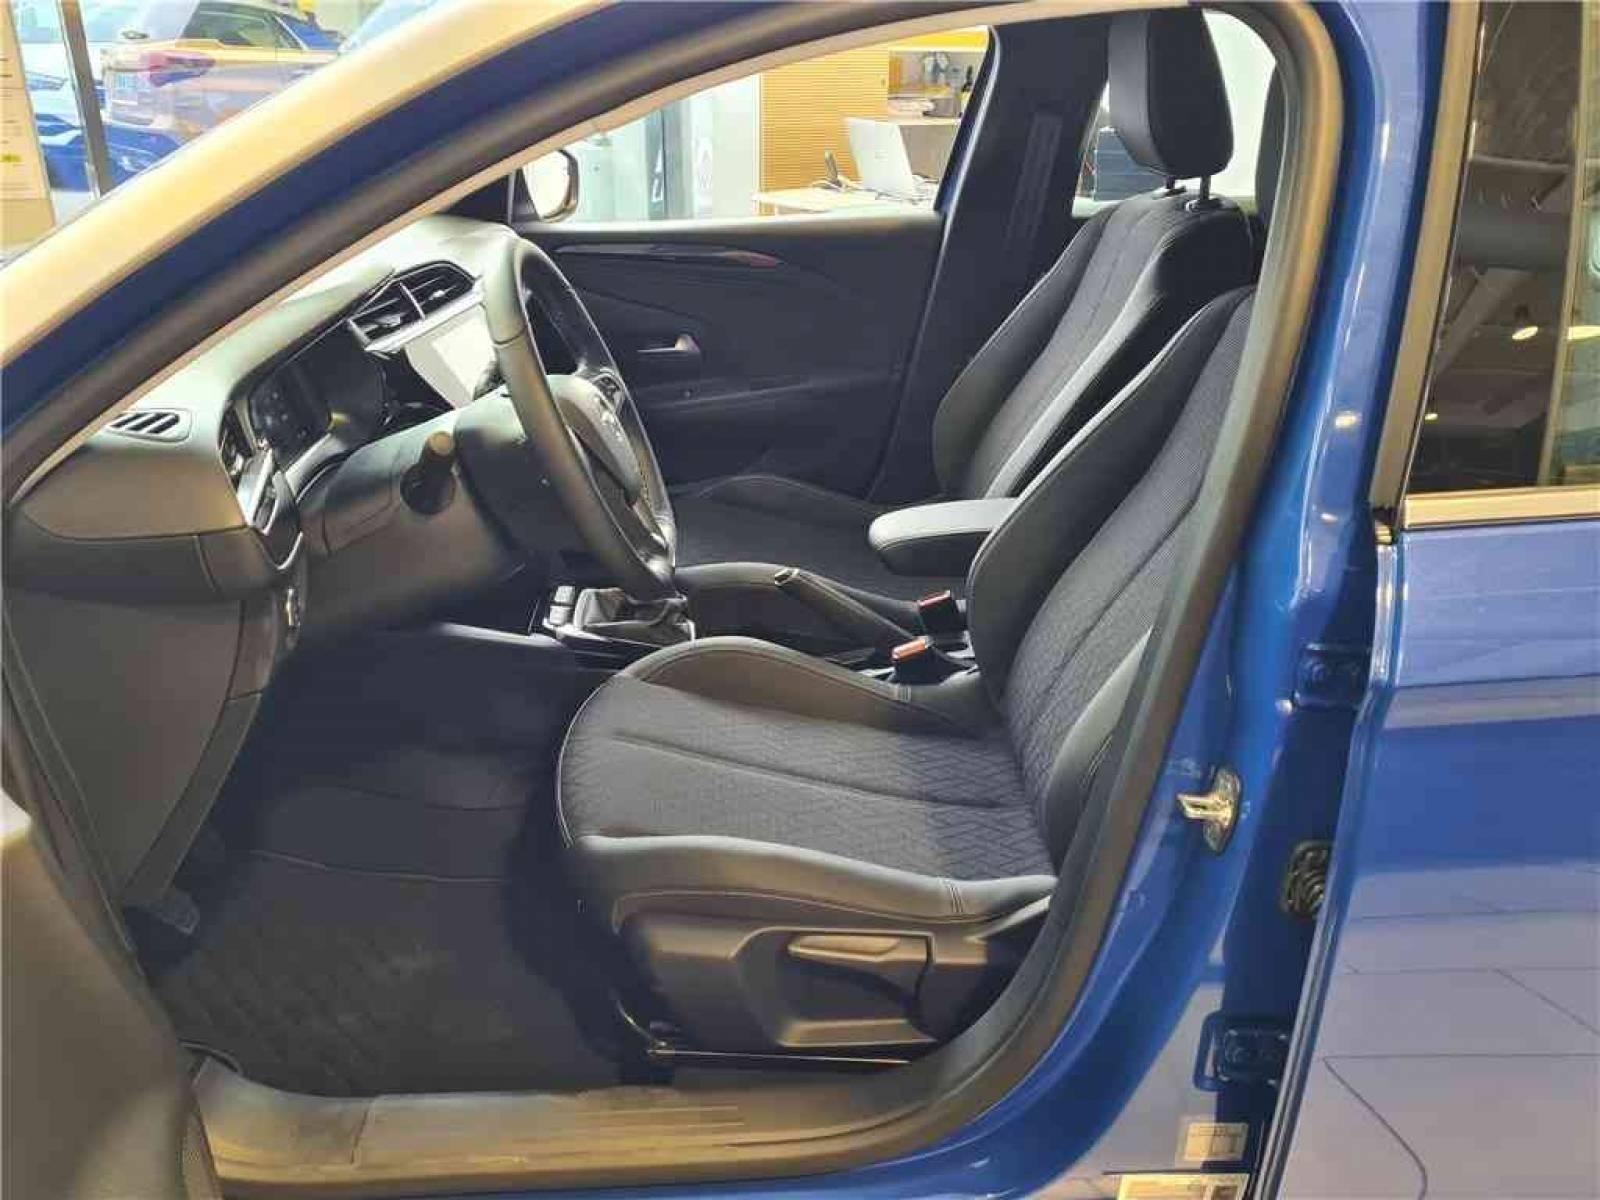 OPEL Corsa 1.2 Turbo 100 ch BVM6 - véhicule d'occasion - Groupe Guillet - Opel Magicauto - Chalon-sur-Saône - 71380 - Saint-Marcel - 18